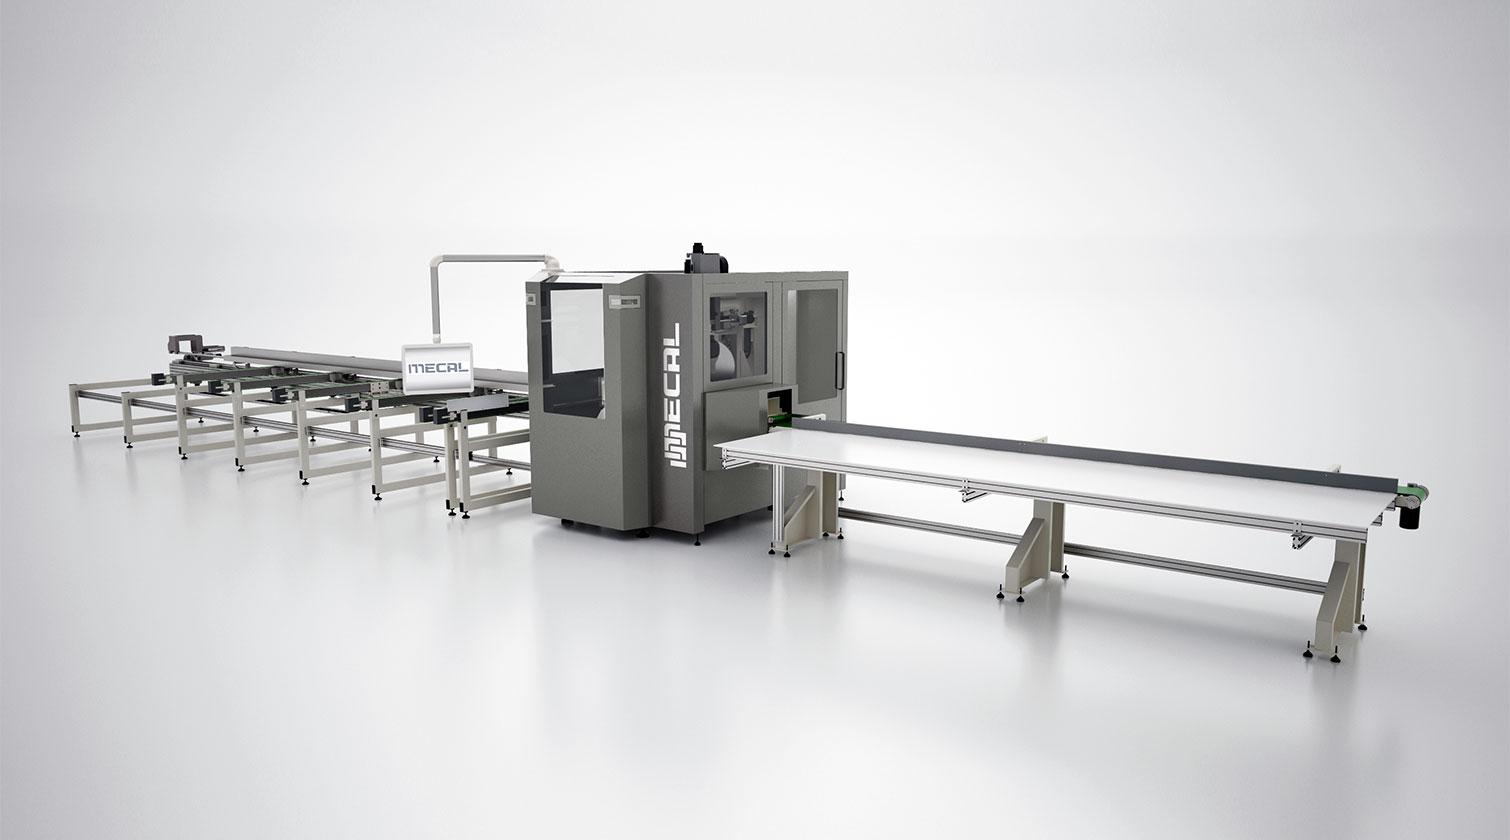 INT aluminum CNC Mecal MC 316 fabrication centre 1